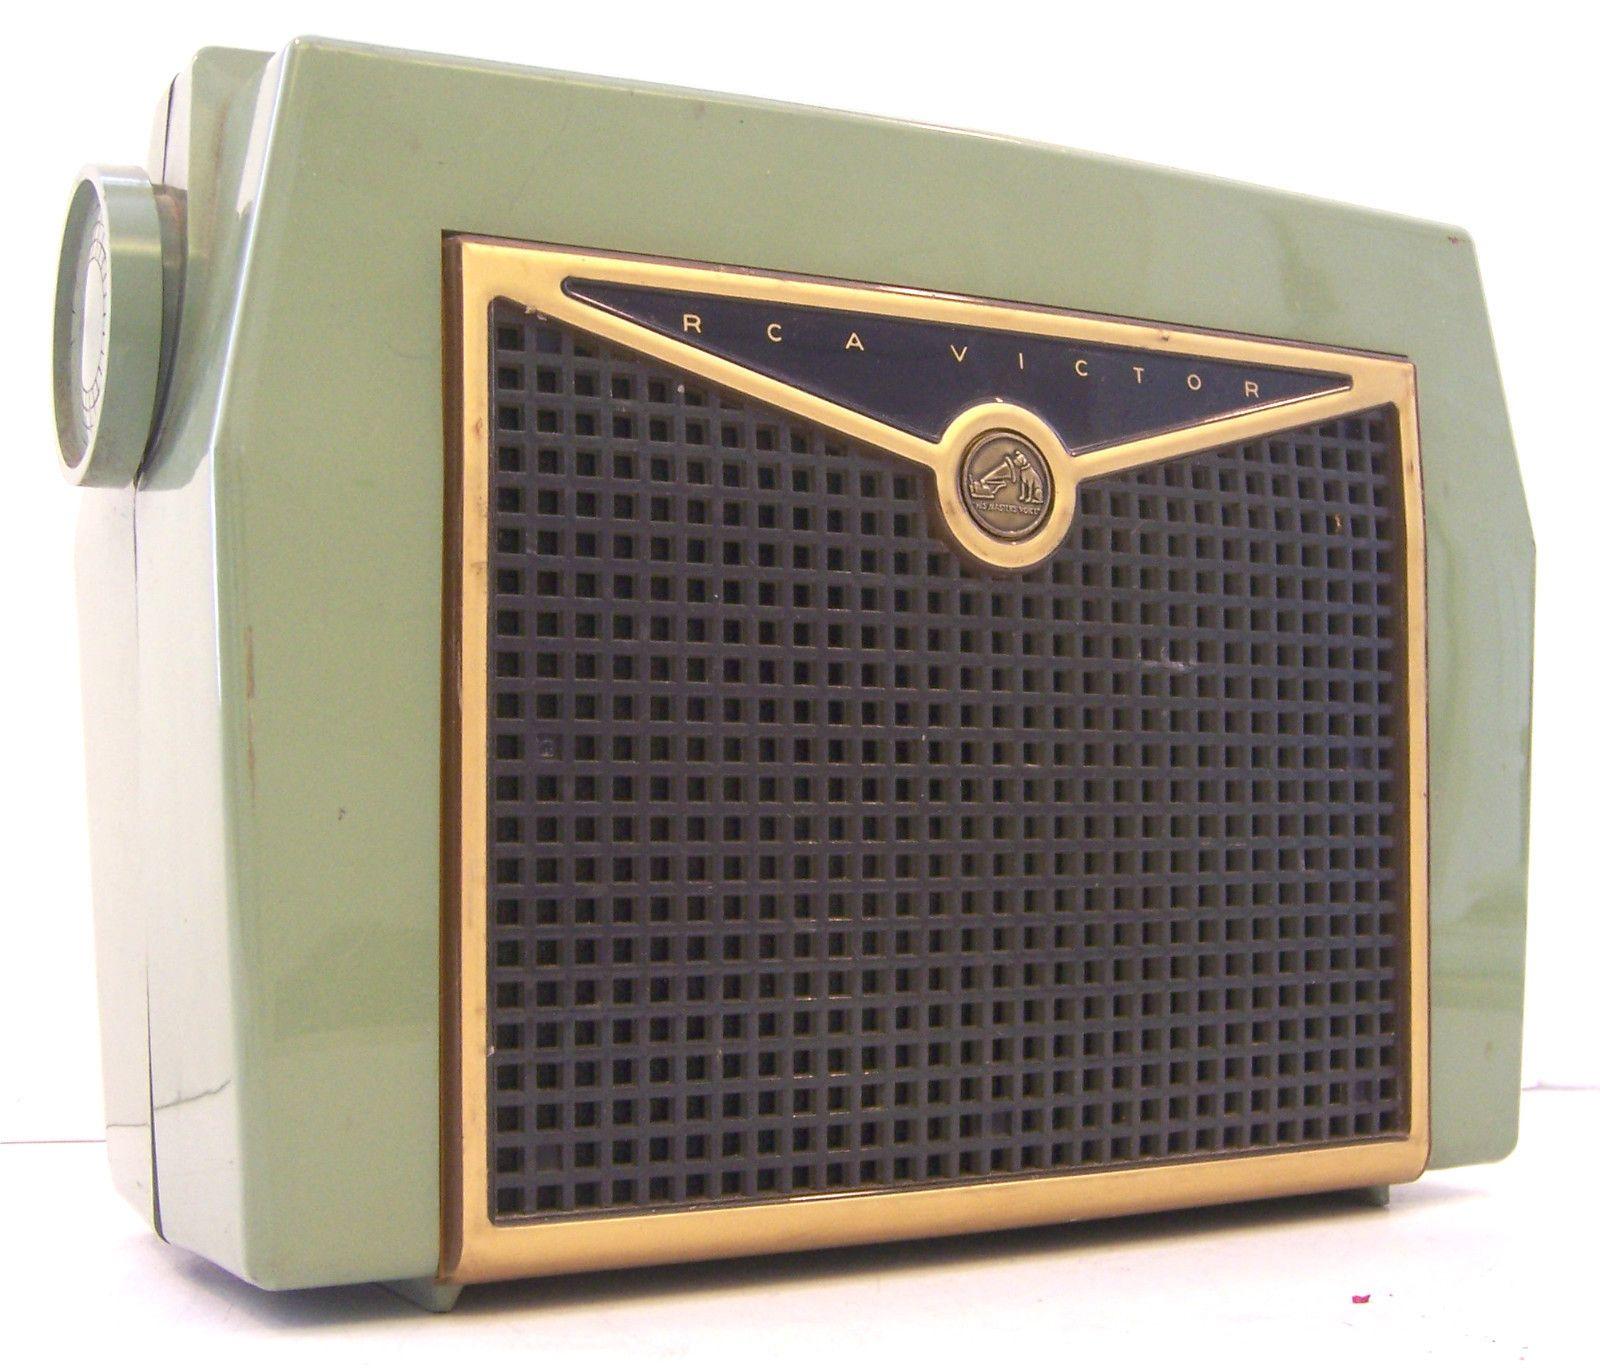 RCA VICTOR PORTABLE AC/DC 4 VACUUM TUBE RADIO MODEL 6-BX-8